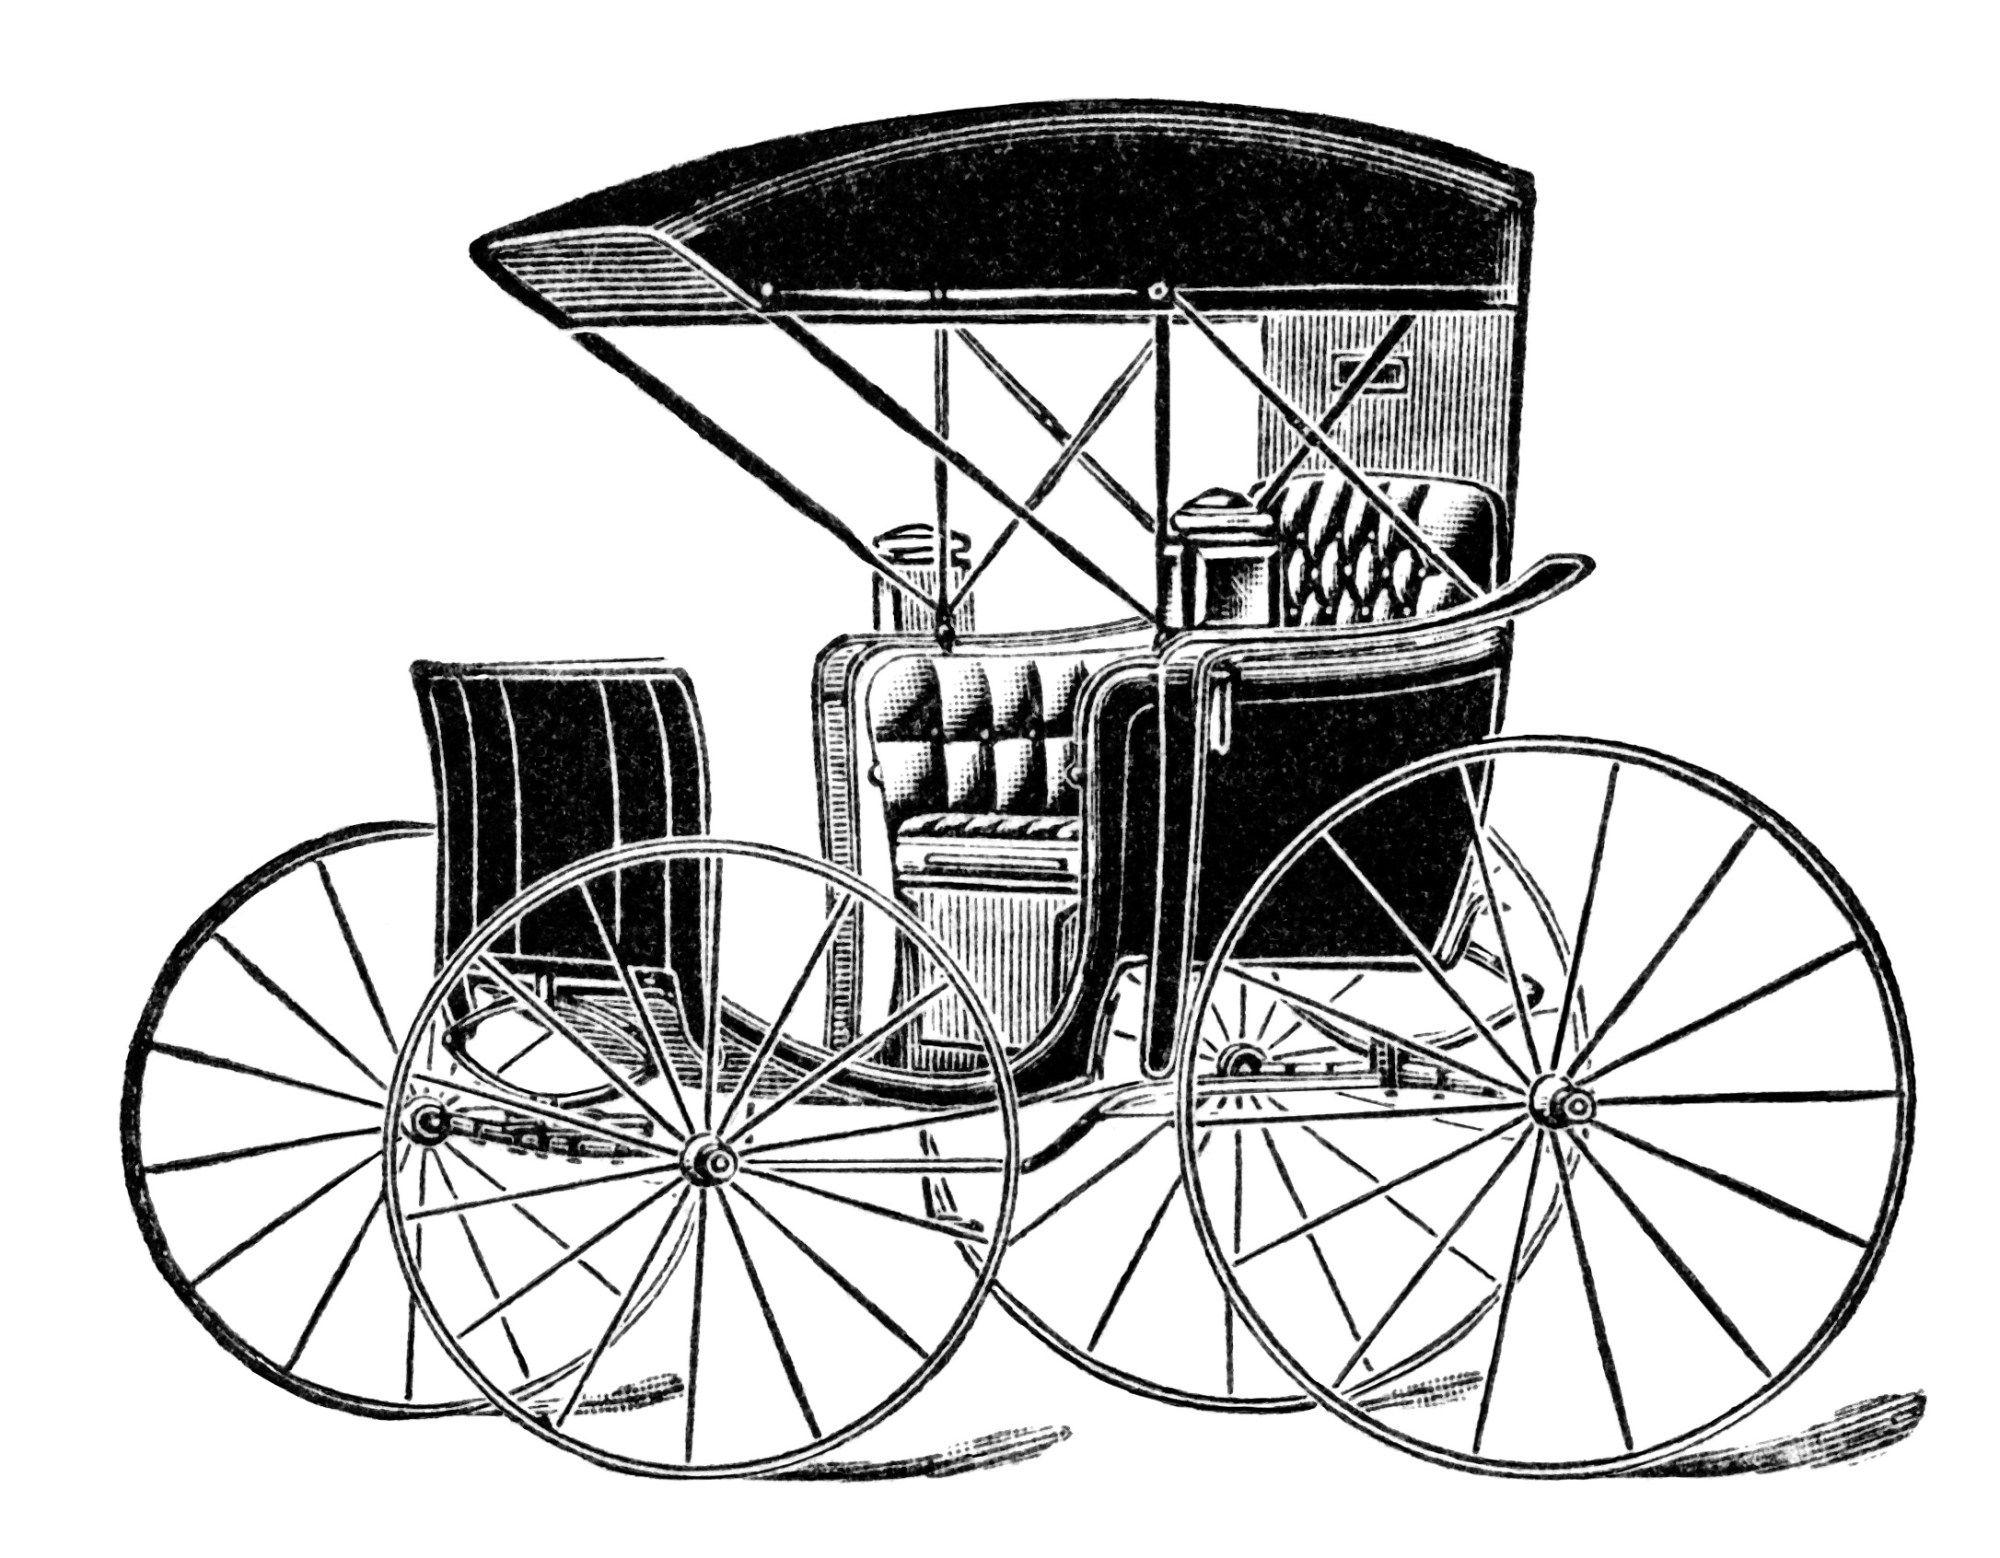 horse drawn carriage clip art, vintage transportation image, black.